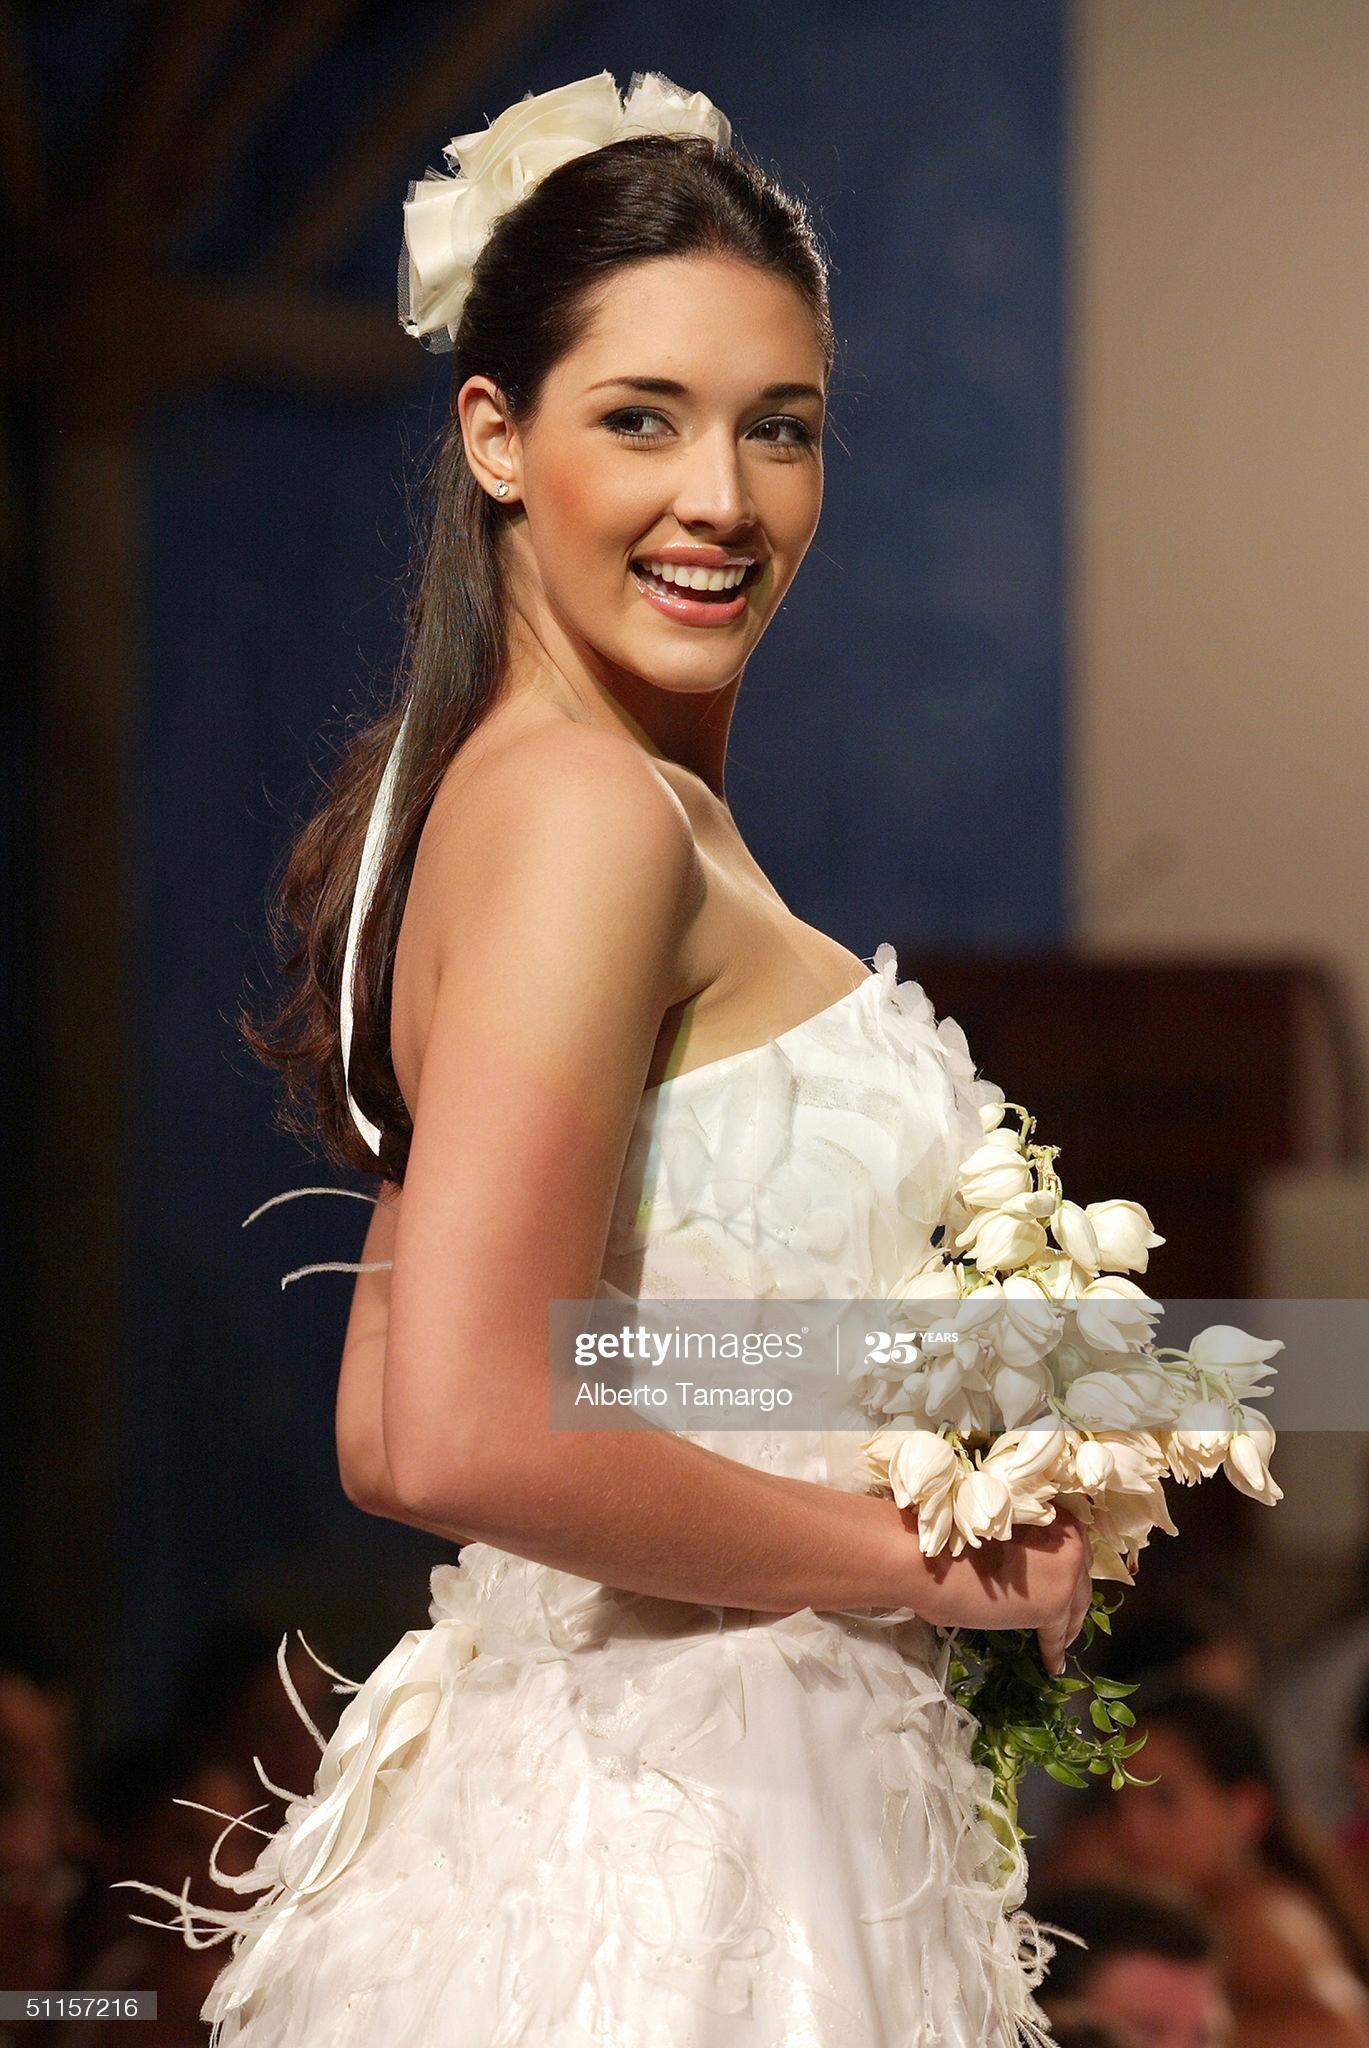 ════ ∘◦❁◦∘ ════ Amelia Vega, Miss Universe 2003. ════ ∘◦❁◦∘ ════ - Página 14 Former15